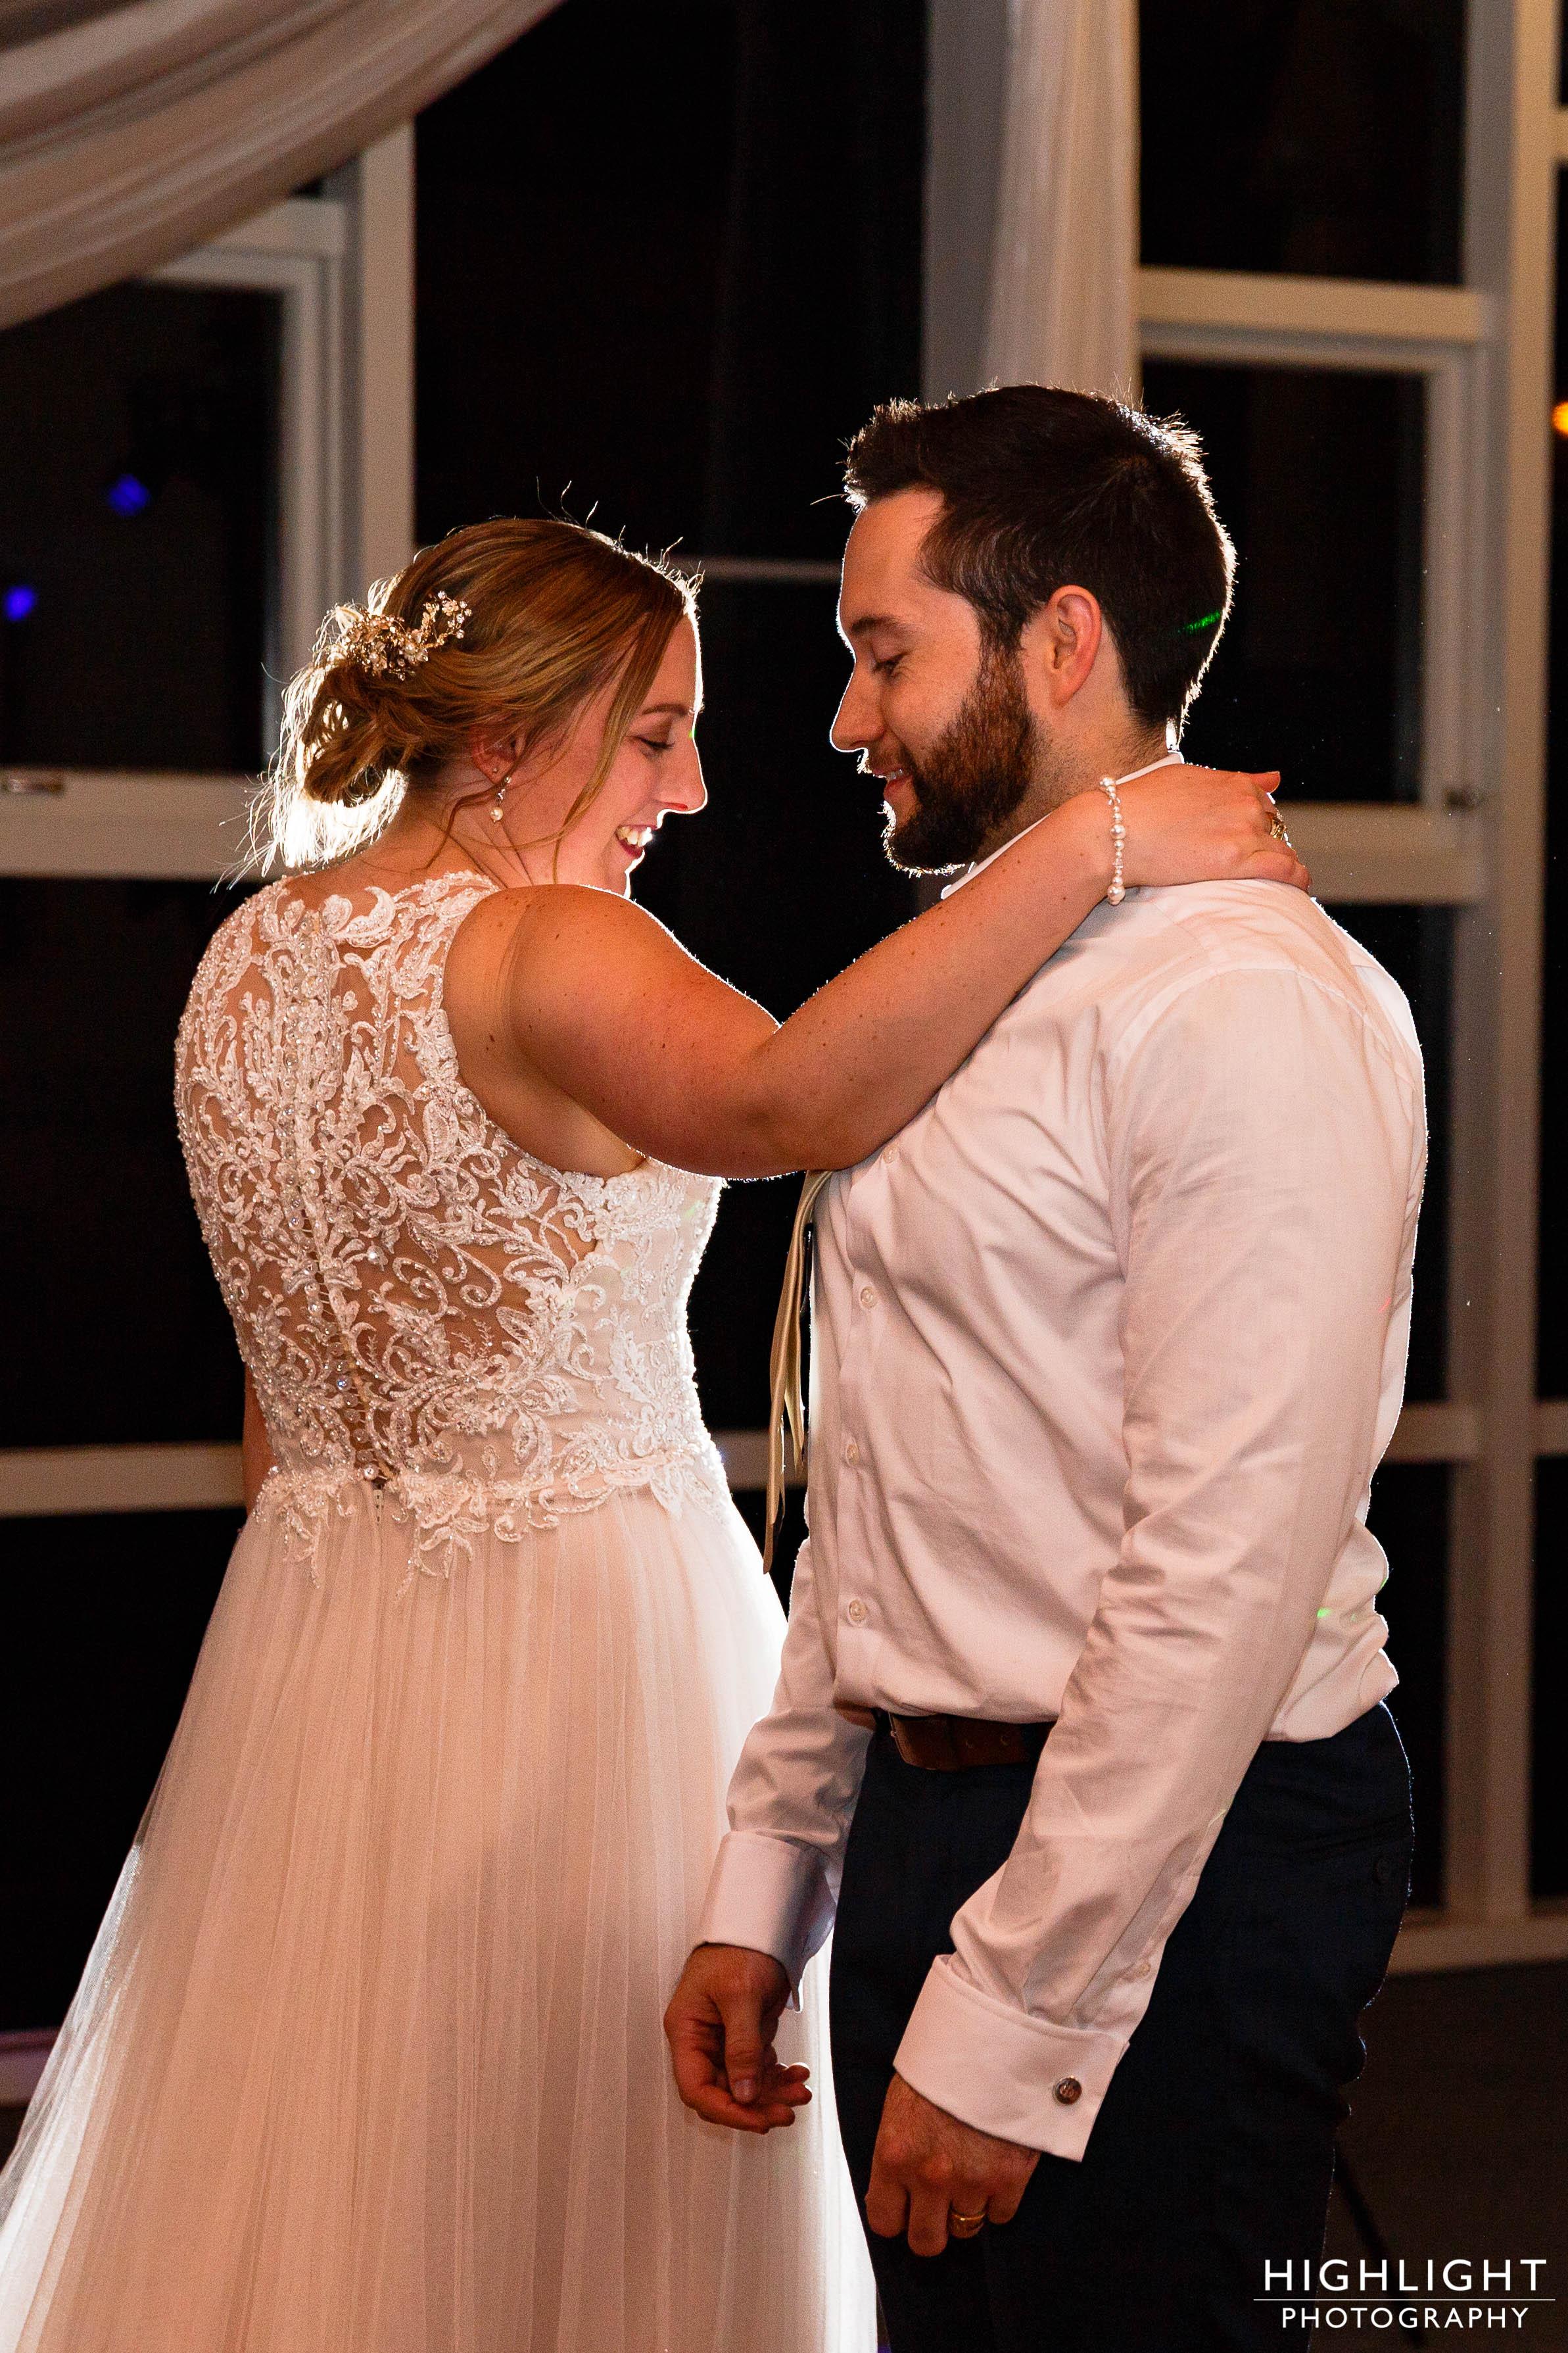 highlight-wedding-photography-palmerston-north-new-zealand-manawatu-chalet-142.jpg